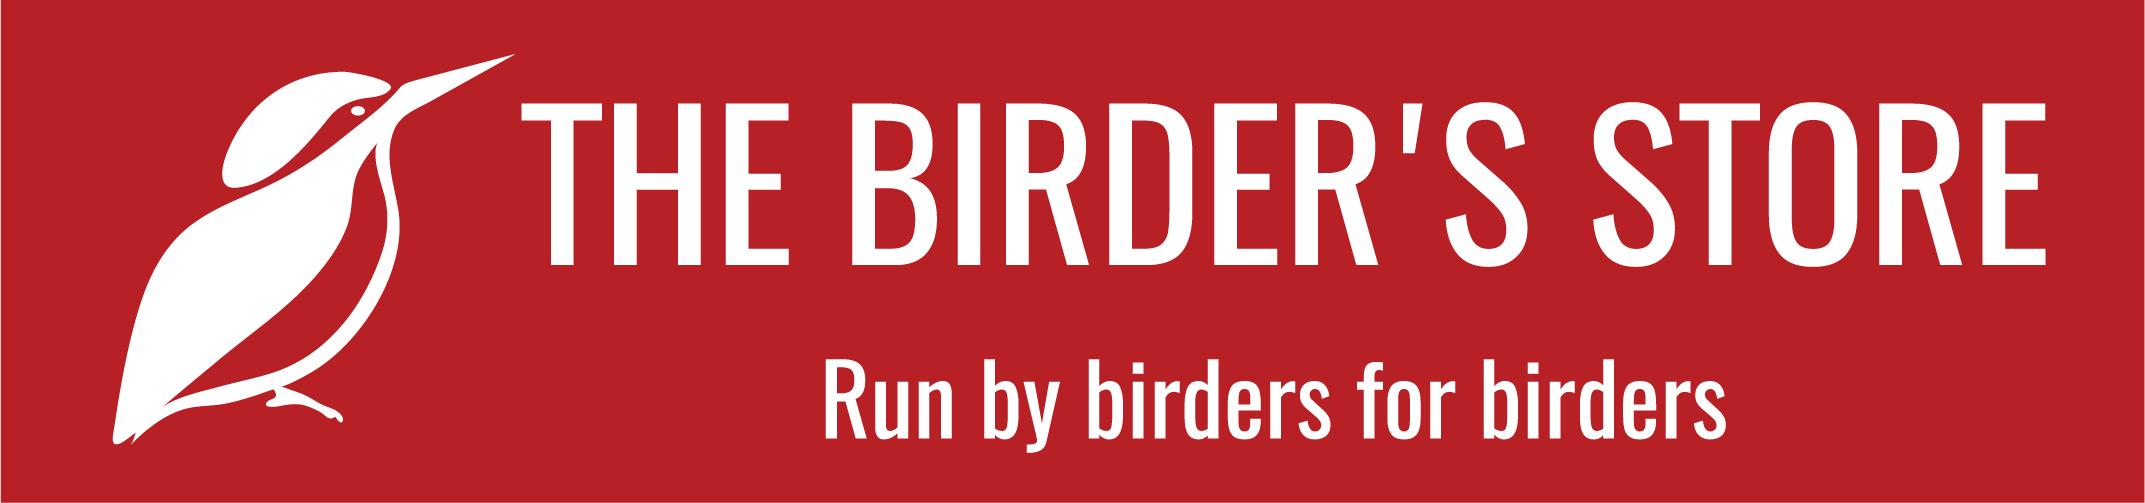 Birder's Store